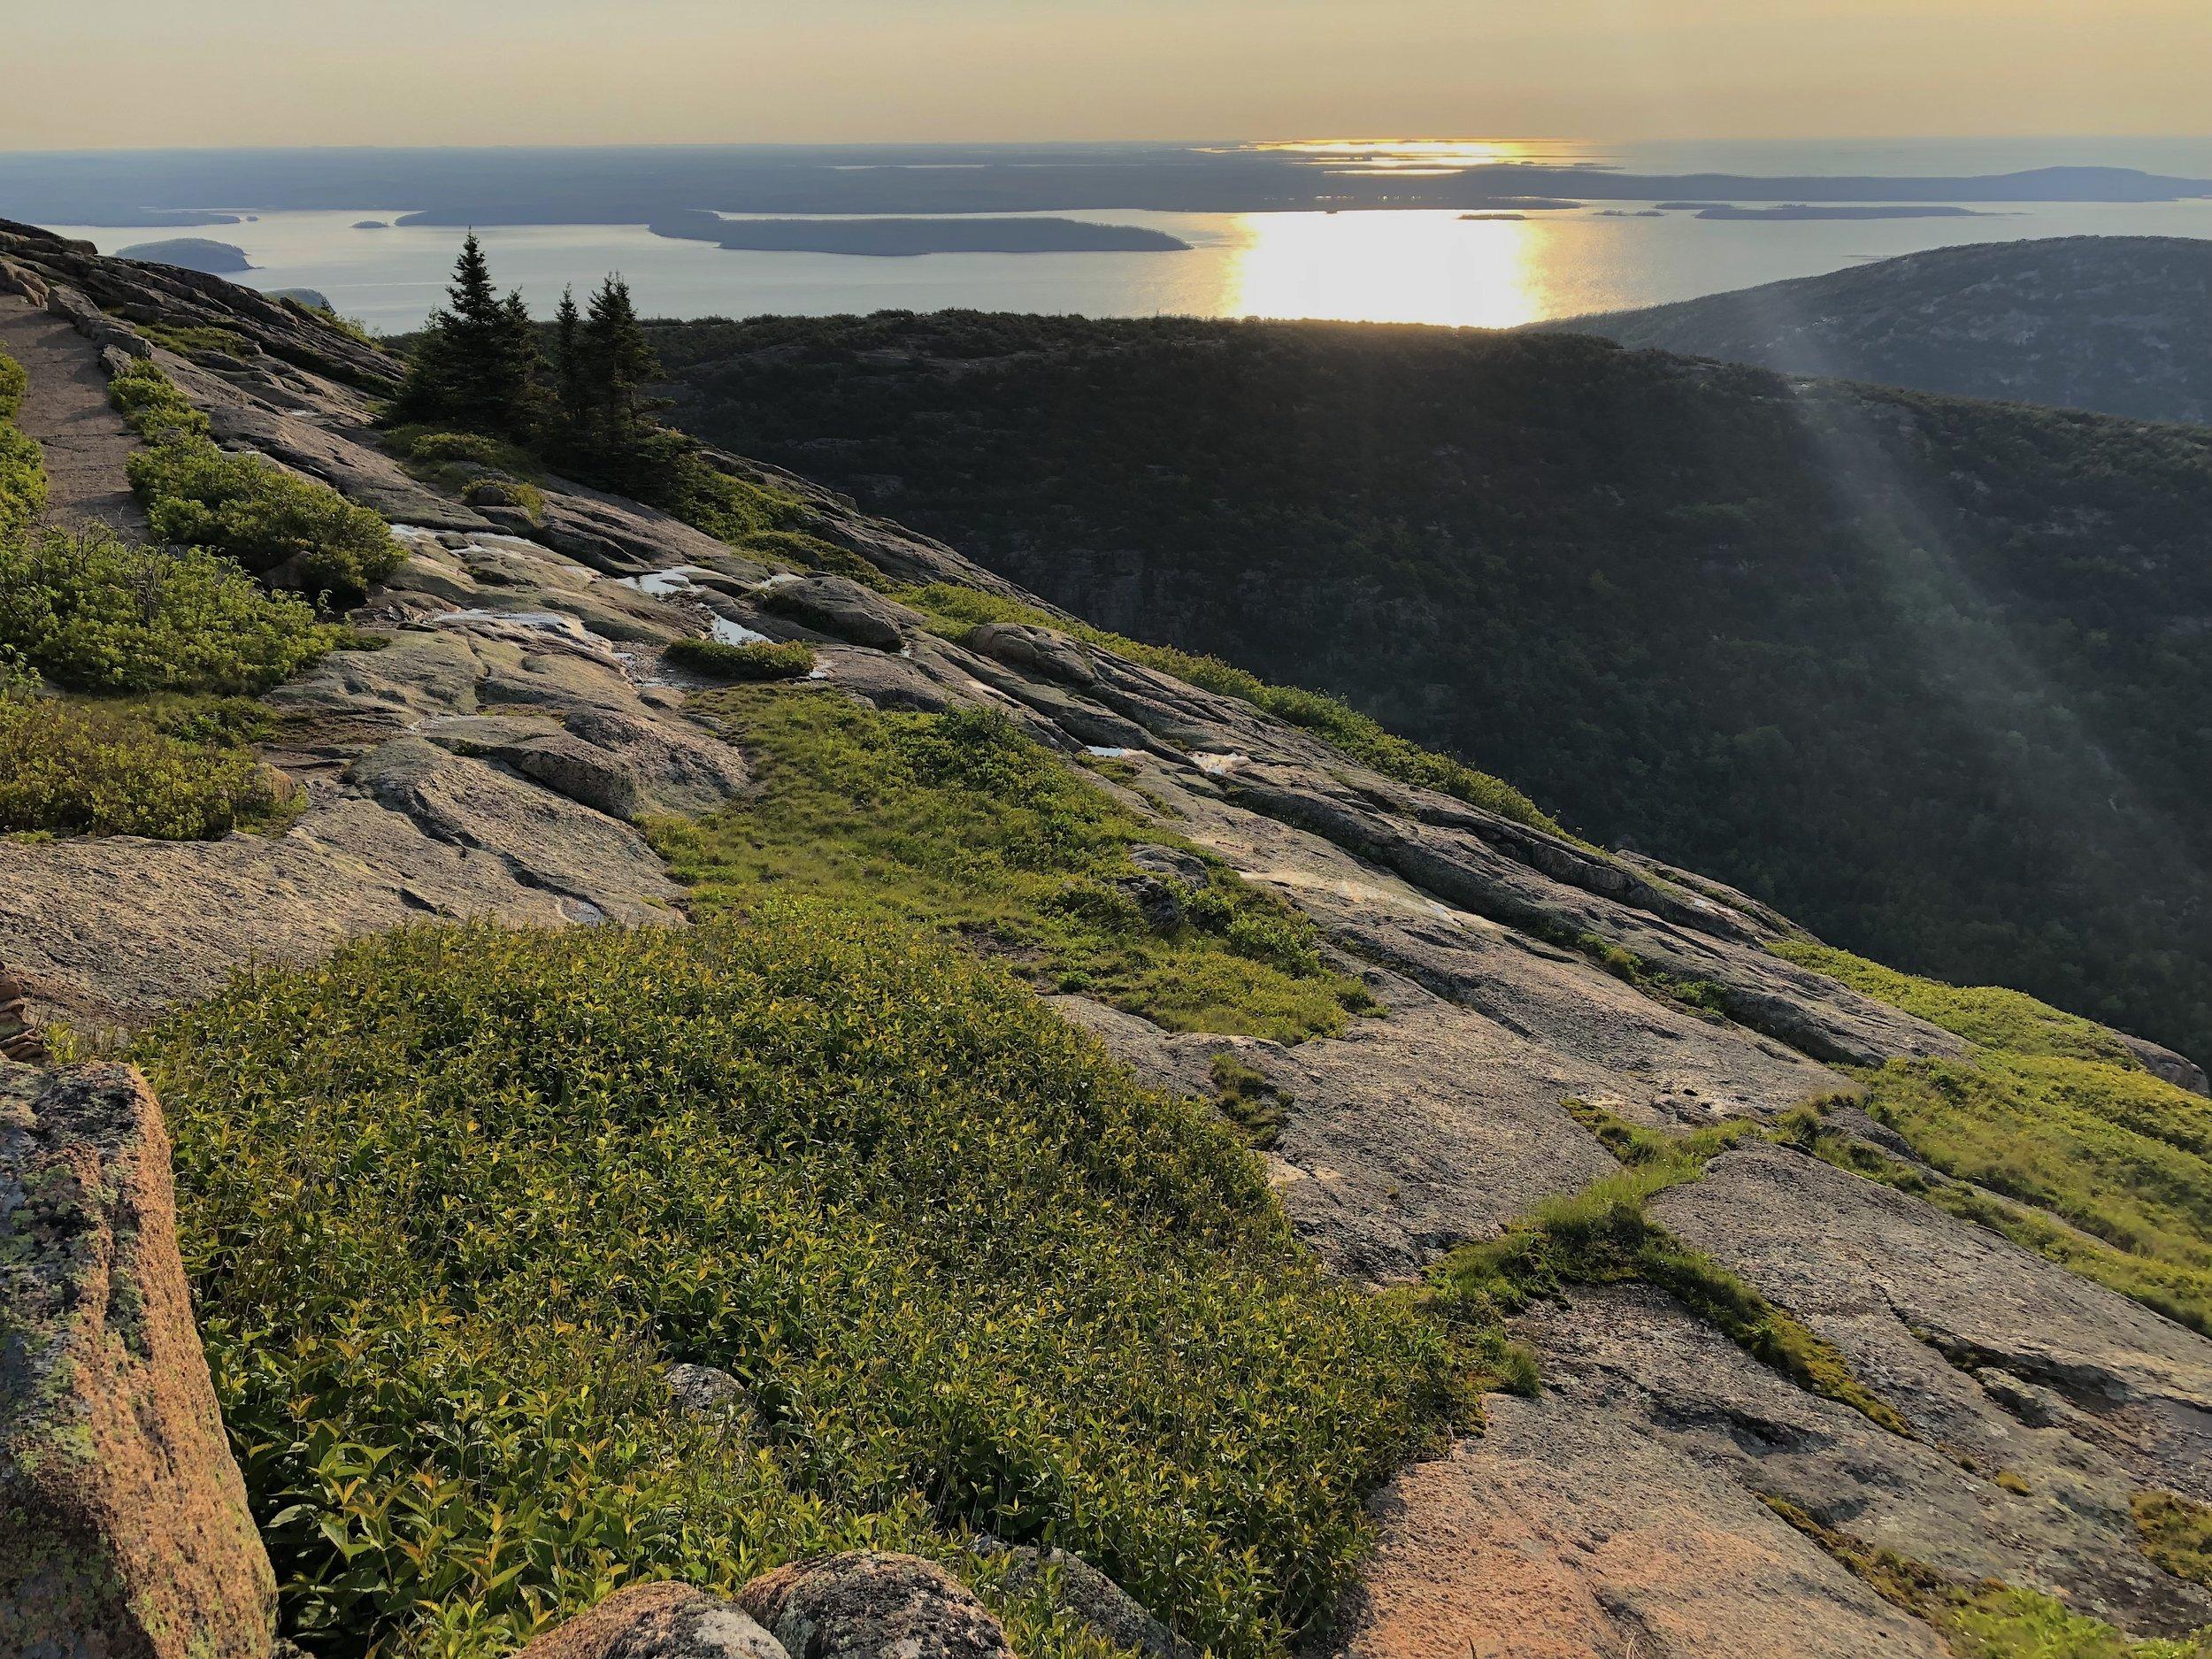 Early morning sun on Cadillac Mountain (Acadia National Park)